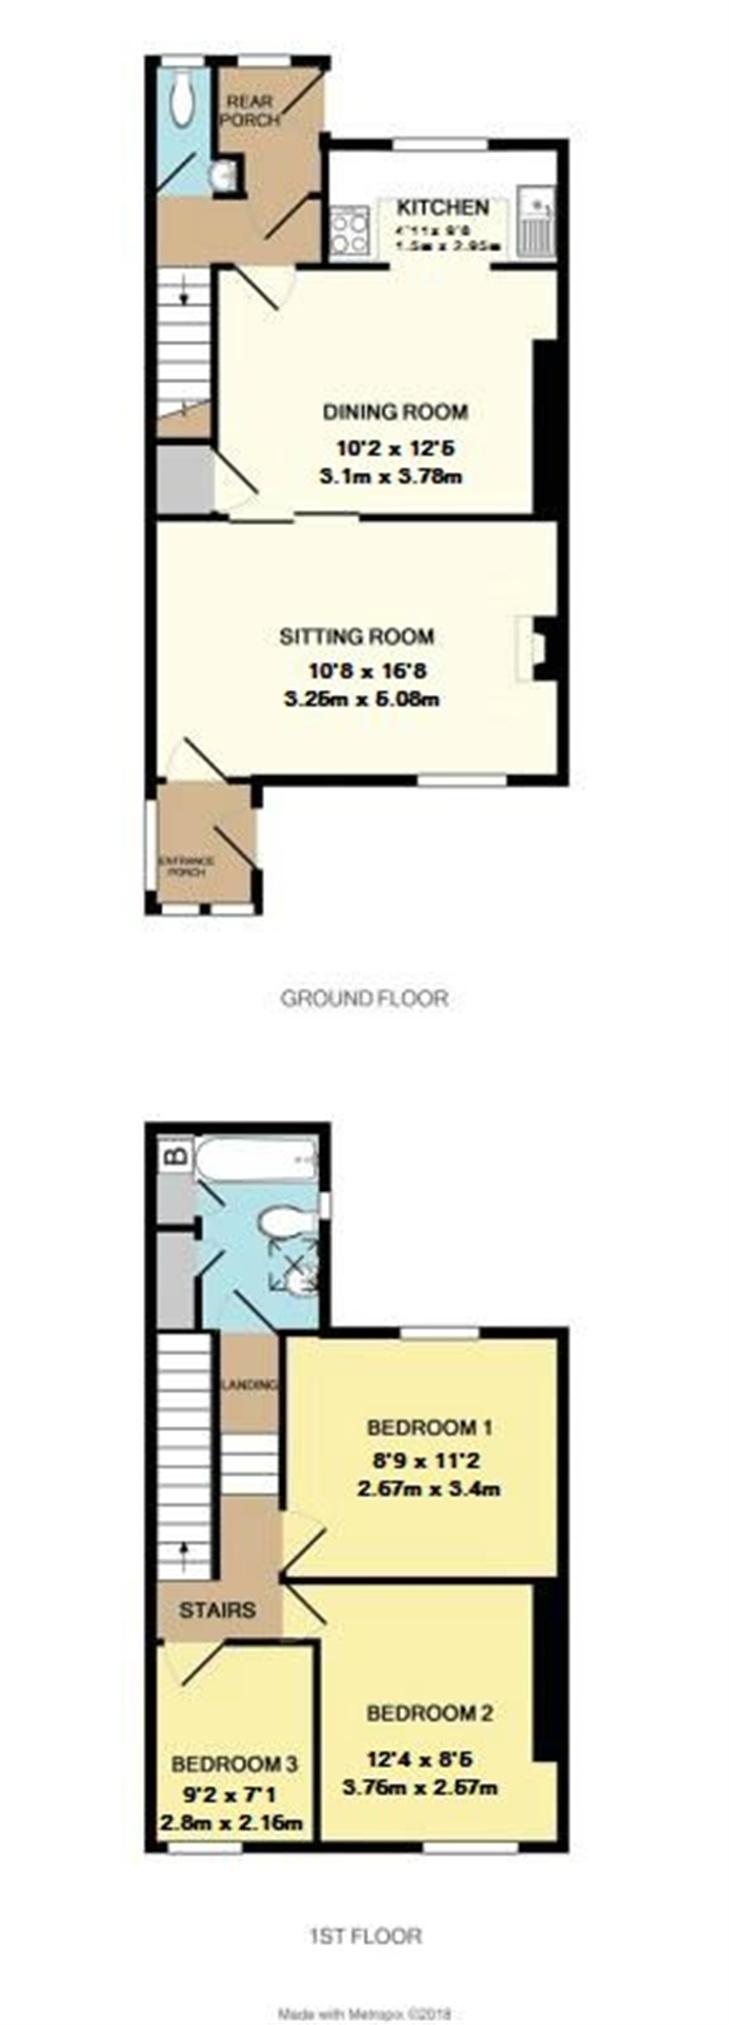 http://www.dezrez.com/estate-agent-software/ImageResizeHandler.do?PropertyID=4667401&photoID=9&AgentID=224&BranchID=333&width=768